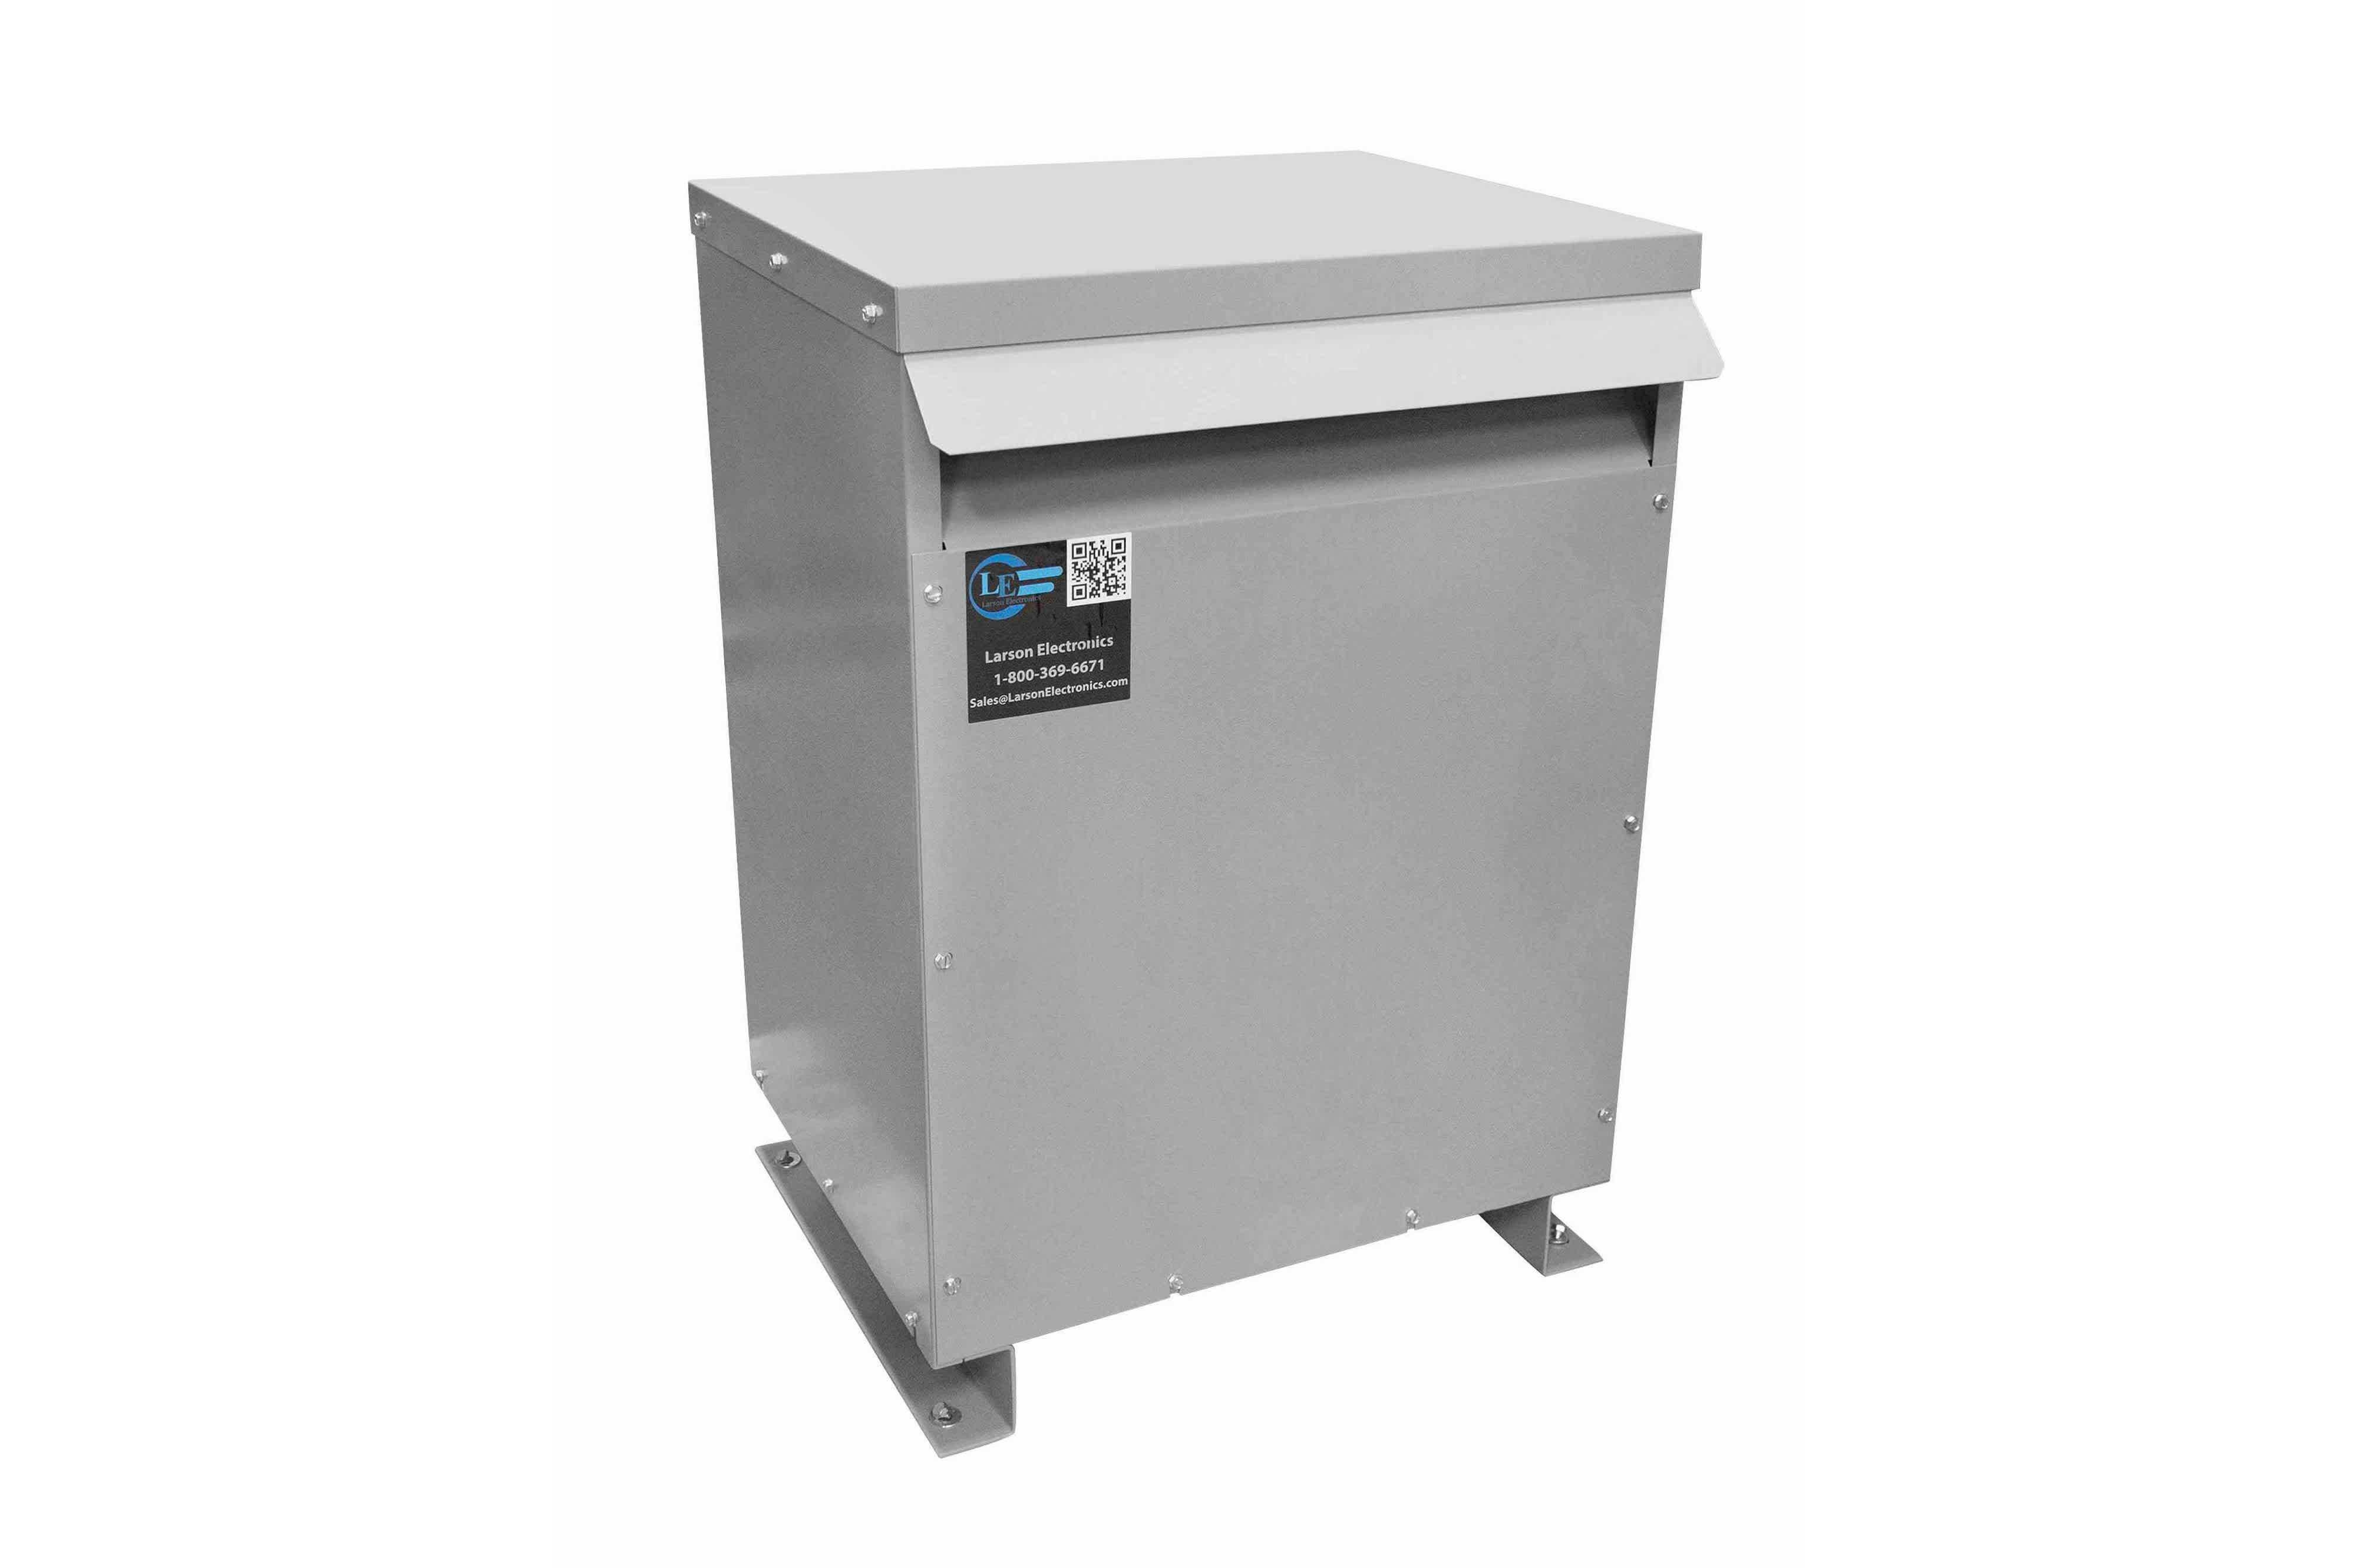 750 kVA 3PH Isolation Transformer, 480V Wye Primary, 240V/120 Delta Secondary, N3R, Ventilated, 60 Hz